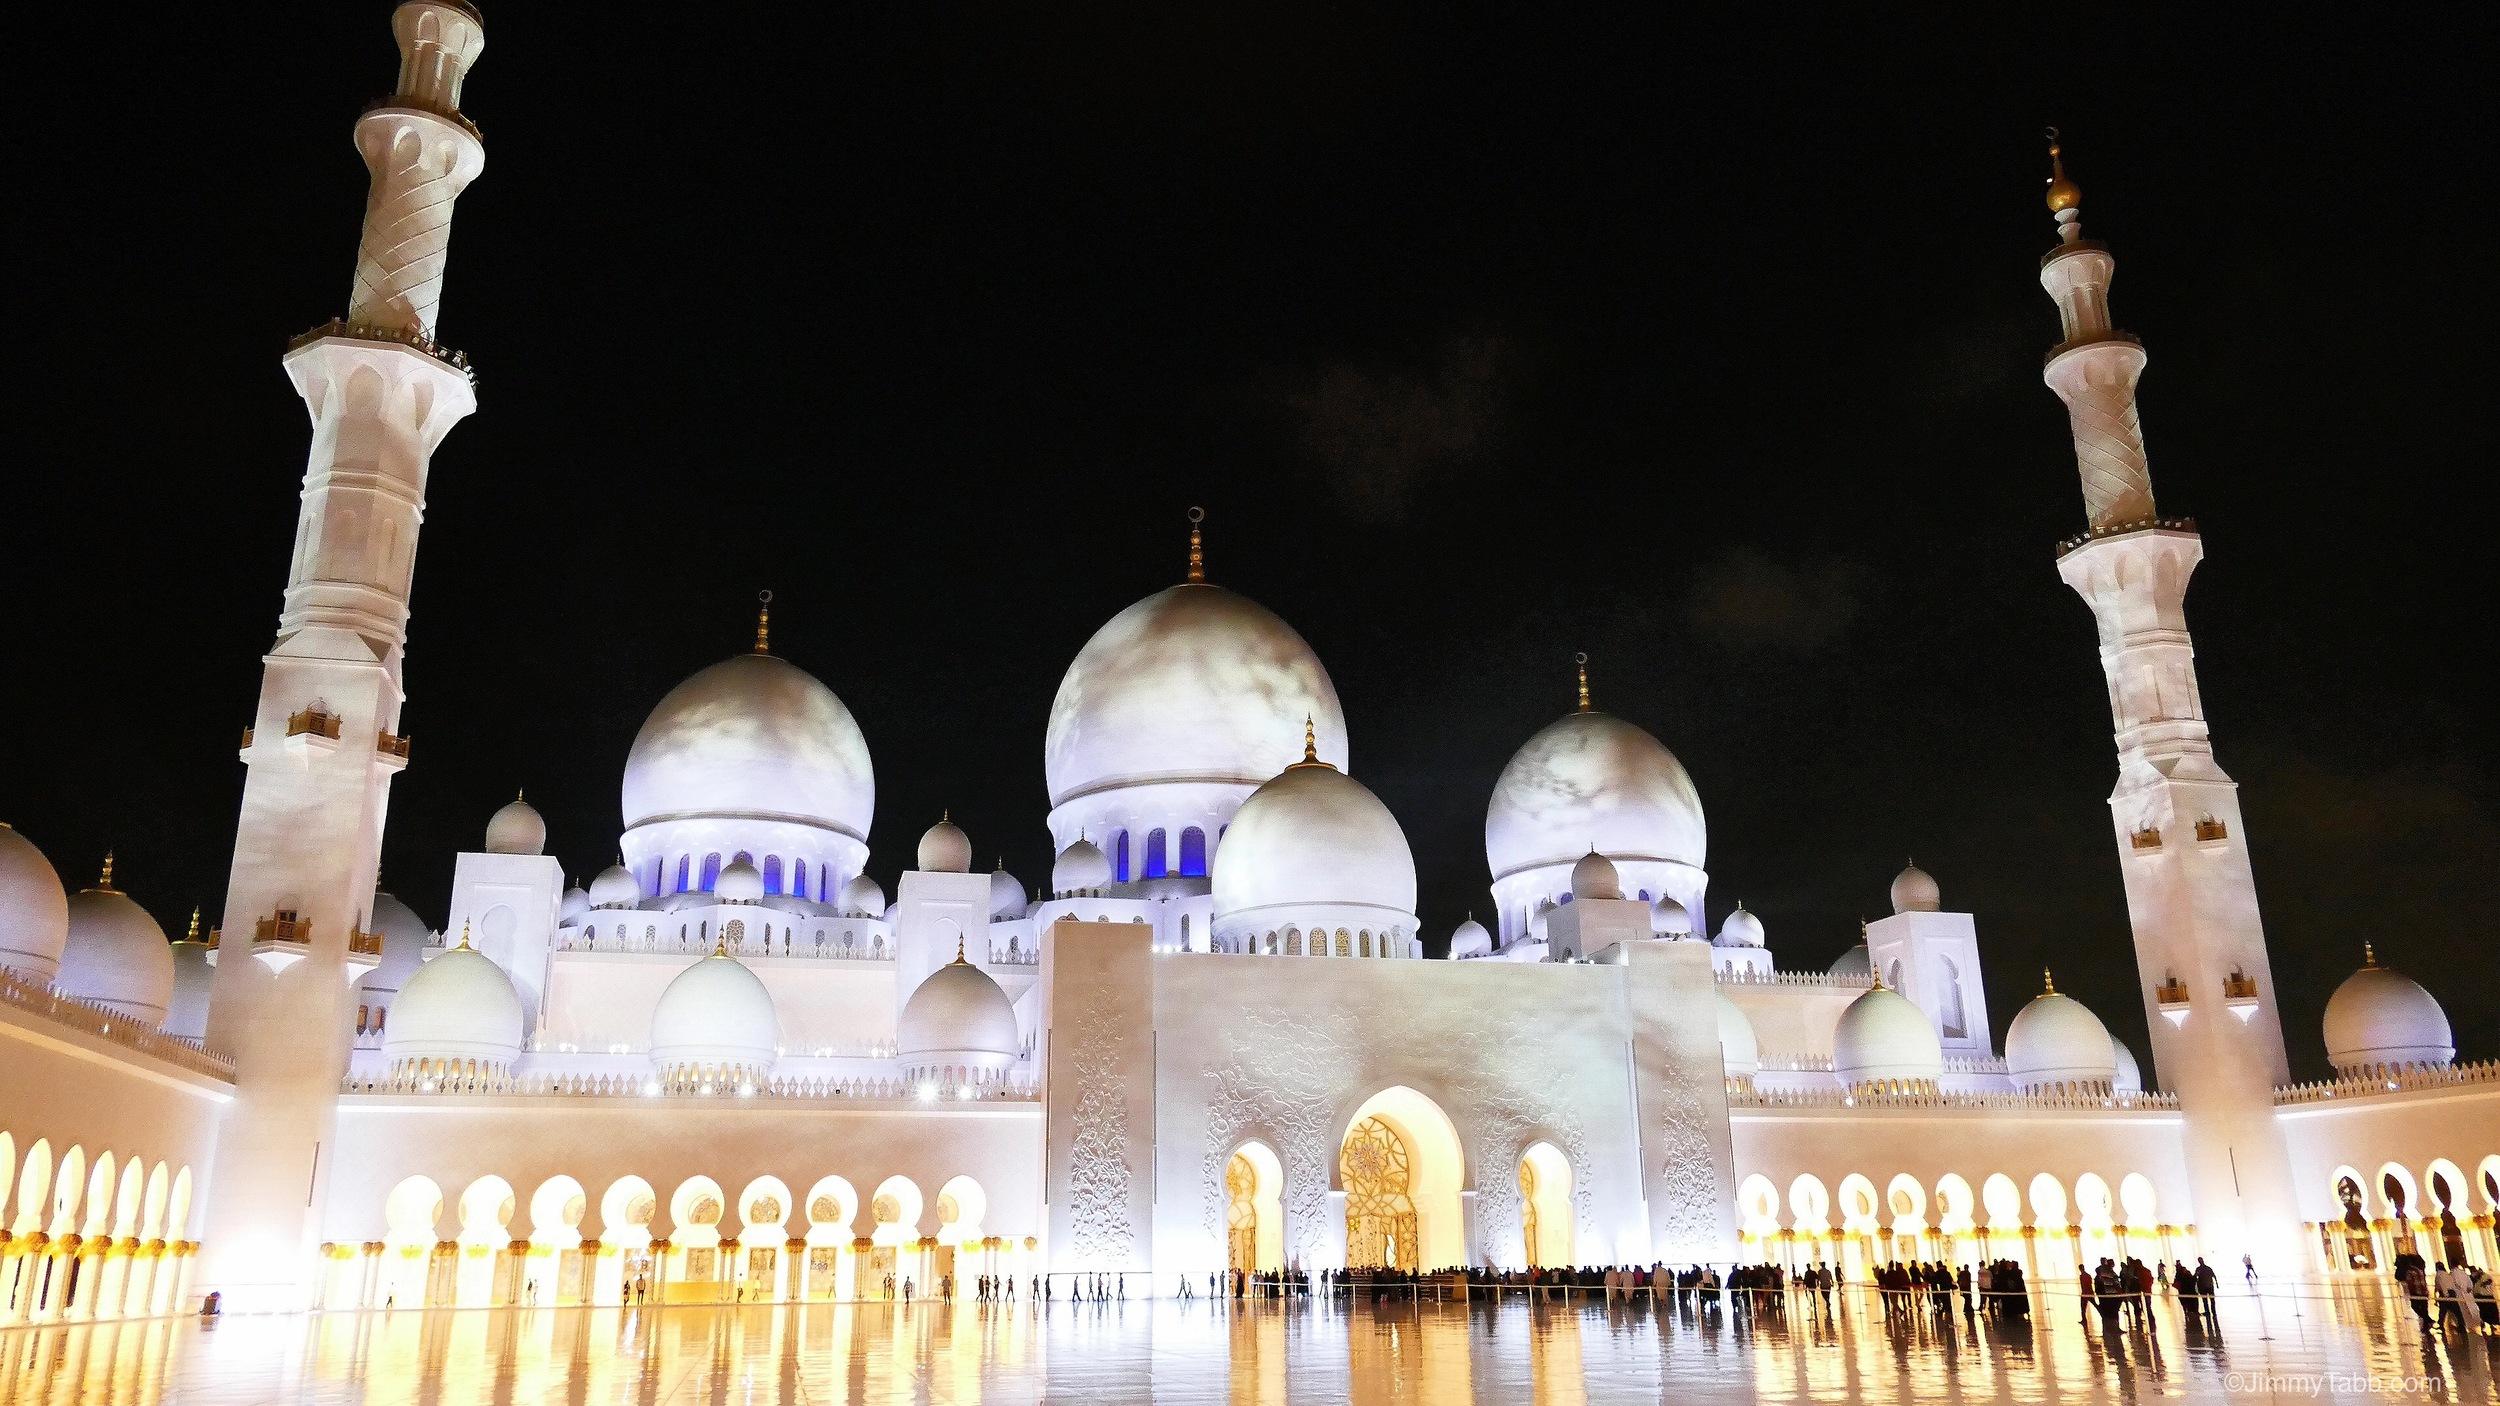 Sheikh Zayed Grand Mosque, Abu Dhabi, UAE (2015)